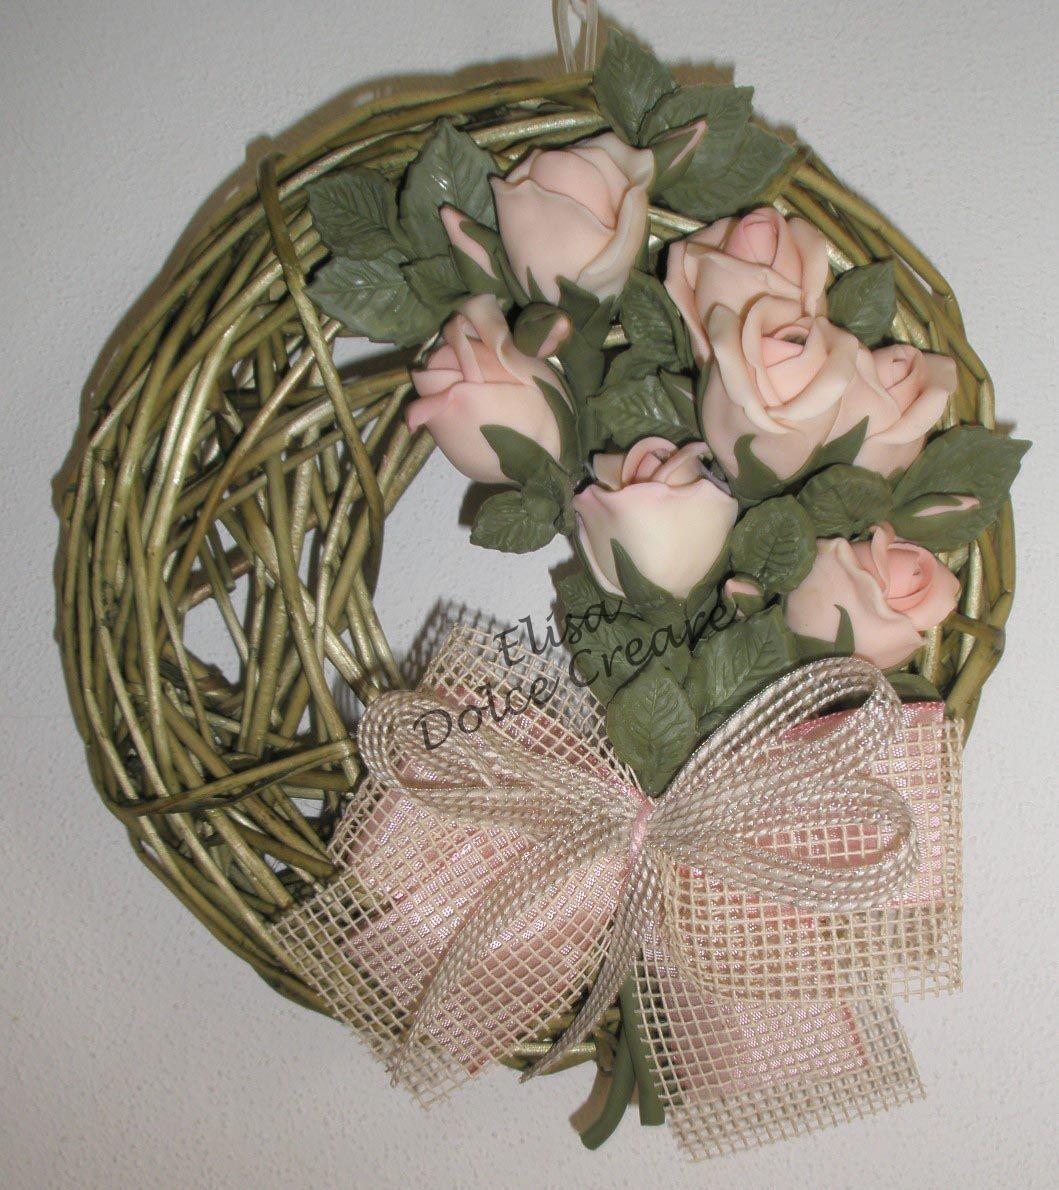 Ghirlanda verde 20x20cm con boccioli di rose rosa